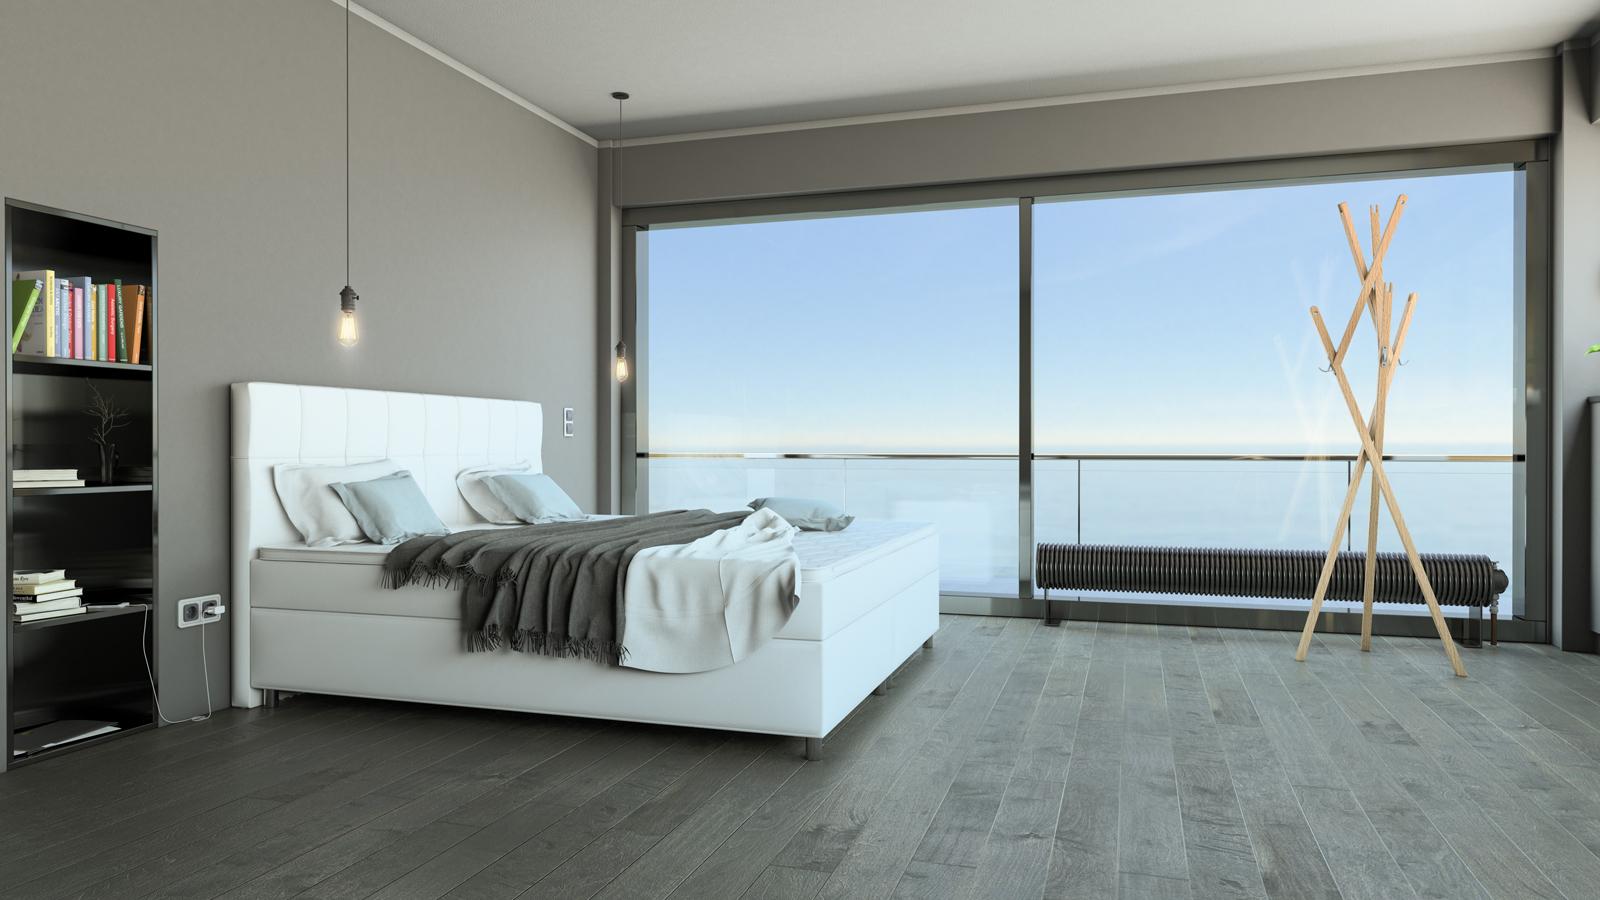 SAM® Boxspringbett Hotelbett 180x200 cm weiß Zalan